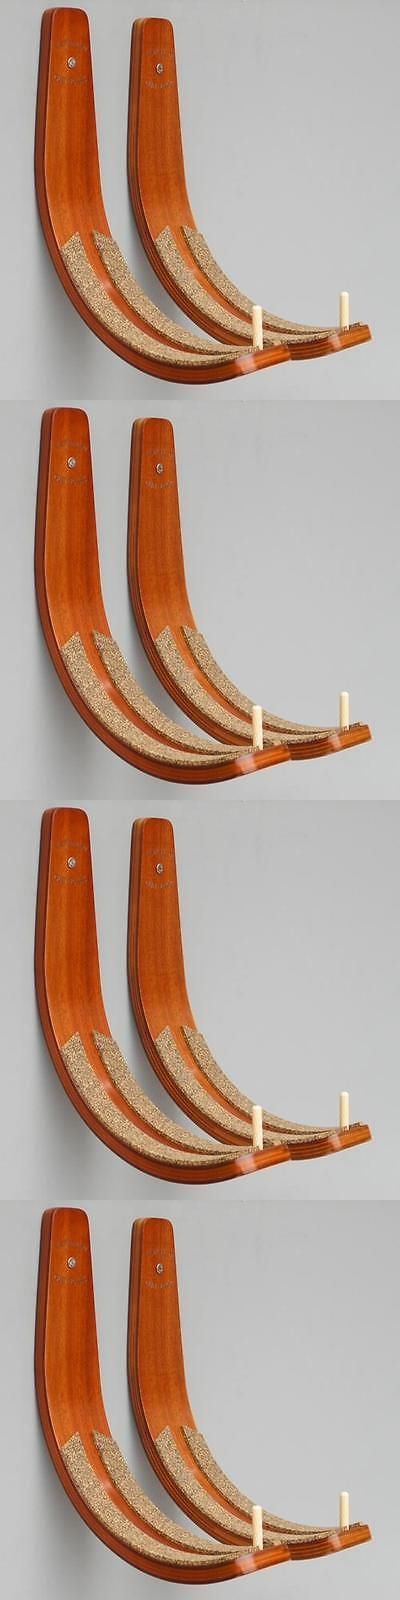 Car Racks 114254: Hawaiian Hand Made Gun Rack Surfboard Rack Brunette -> BUY IT NOW ONLY: $49.95 on eBay!